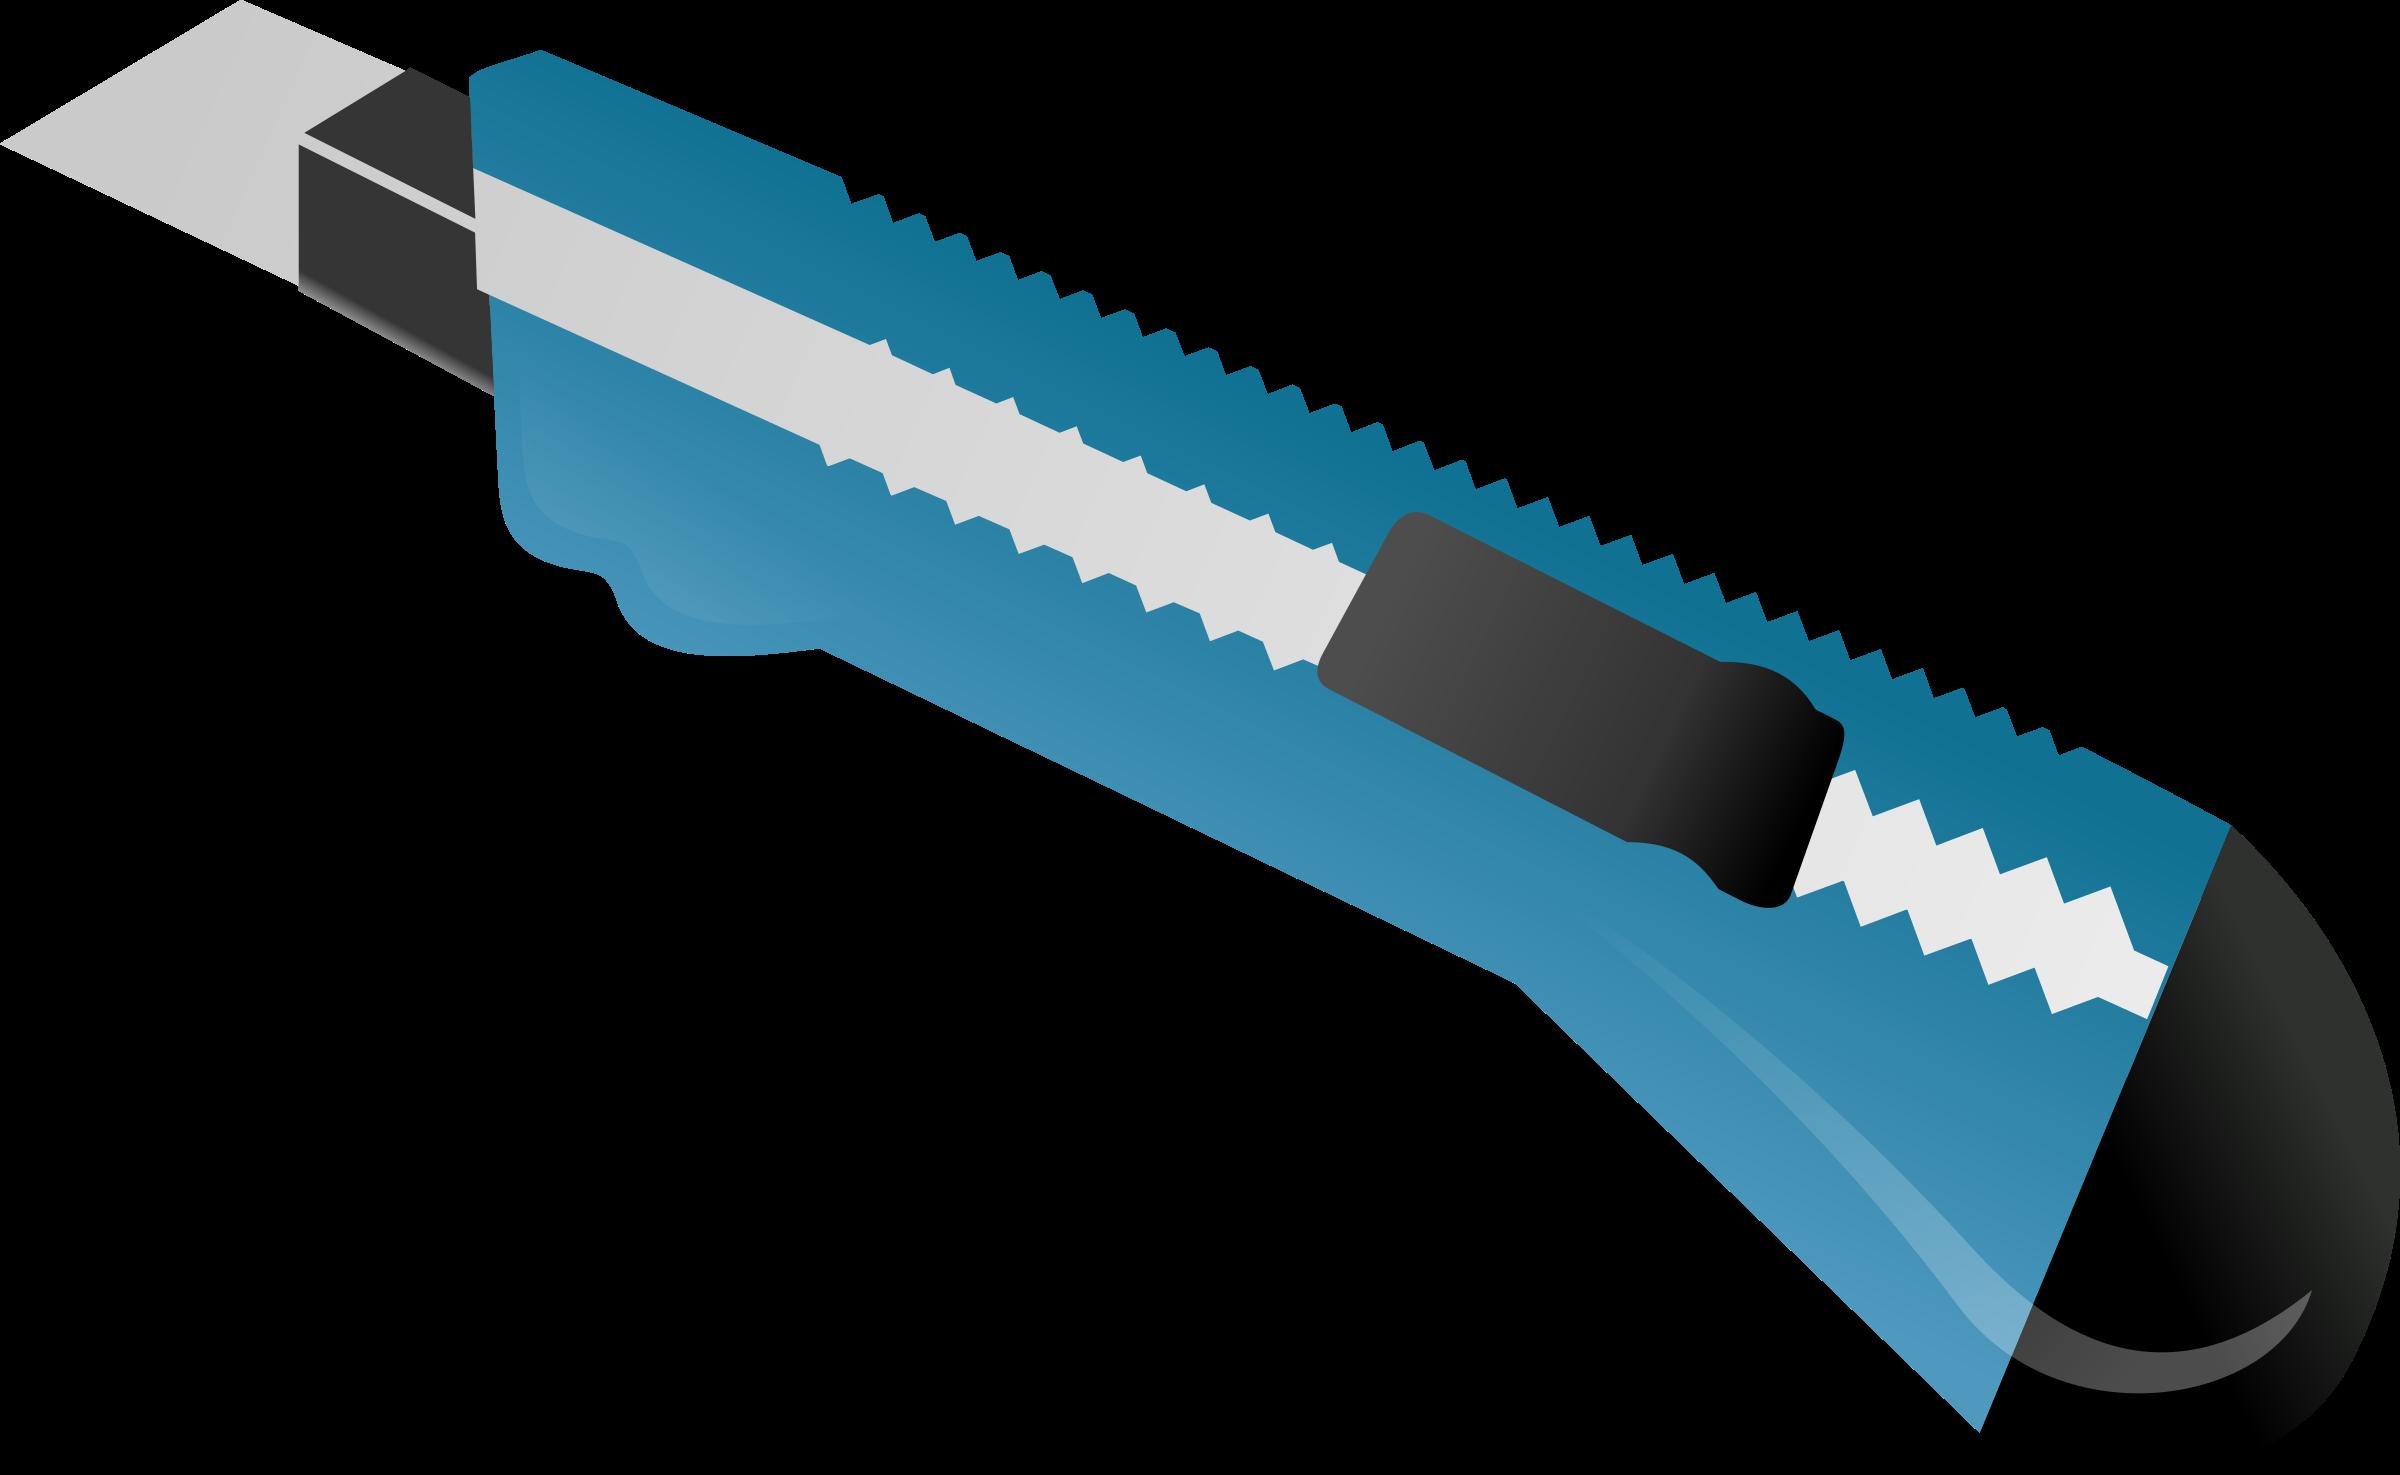 Box cutter utility blue. Knife clipart sharp object